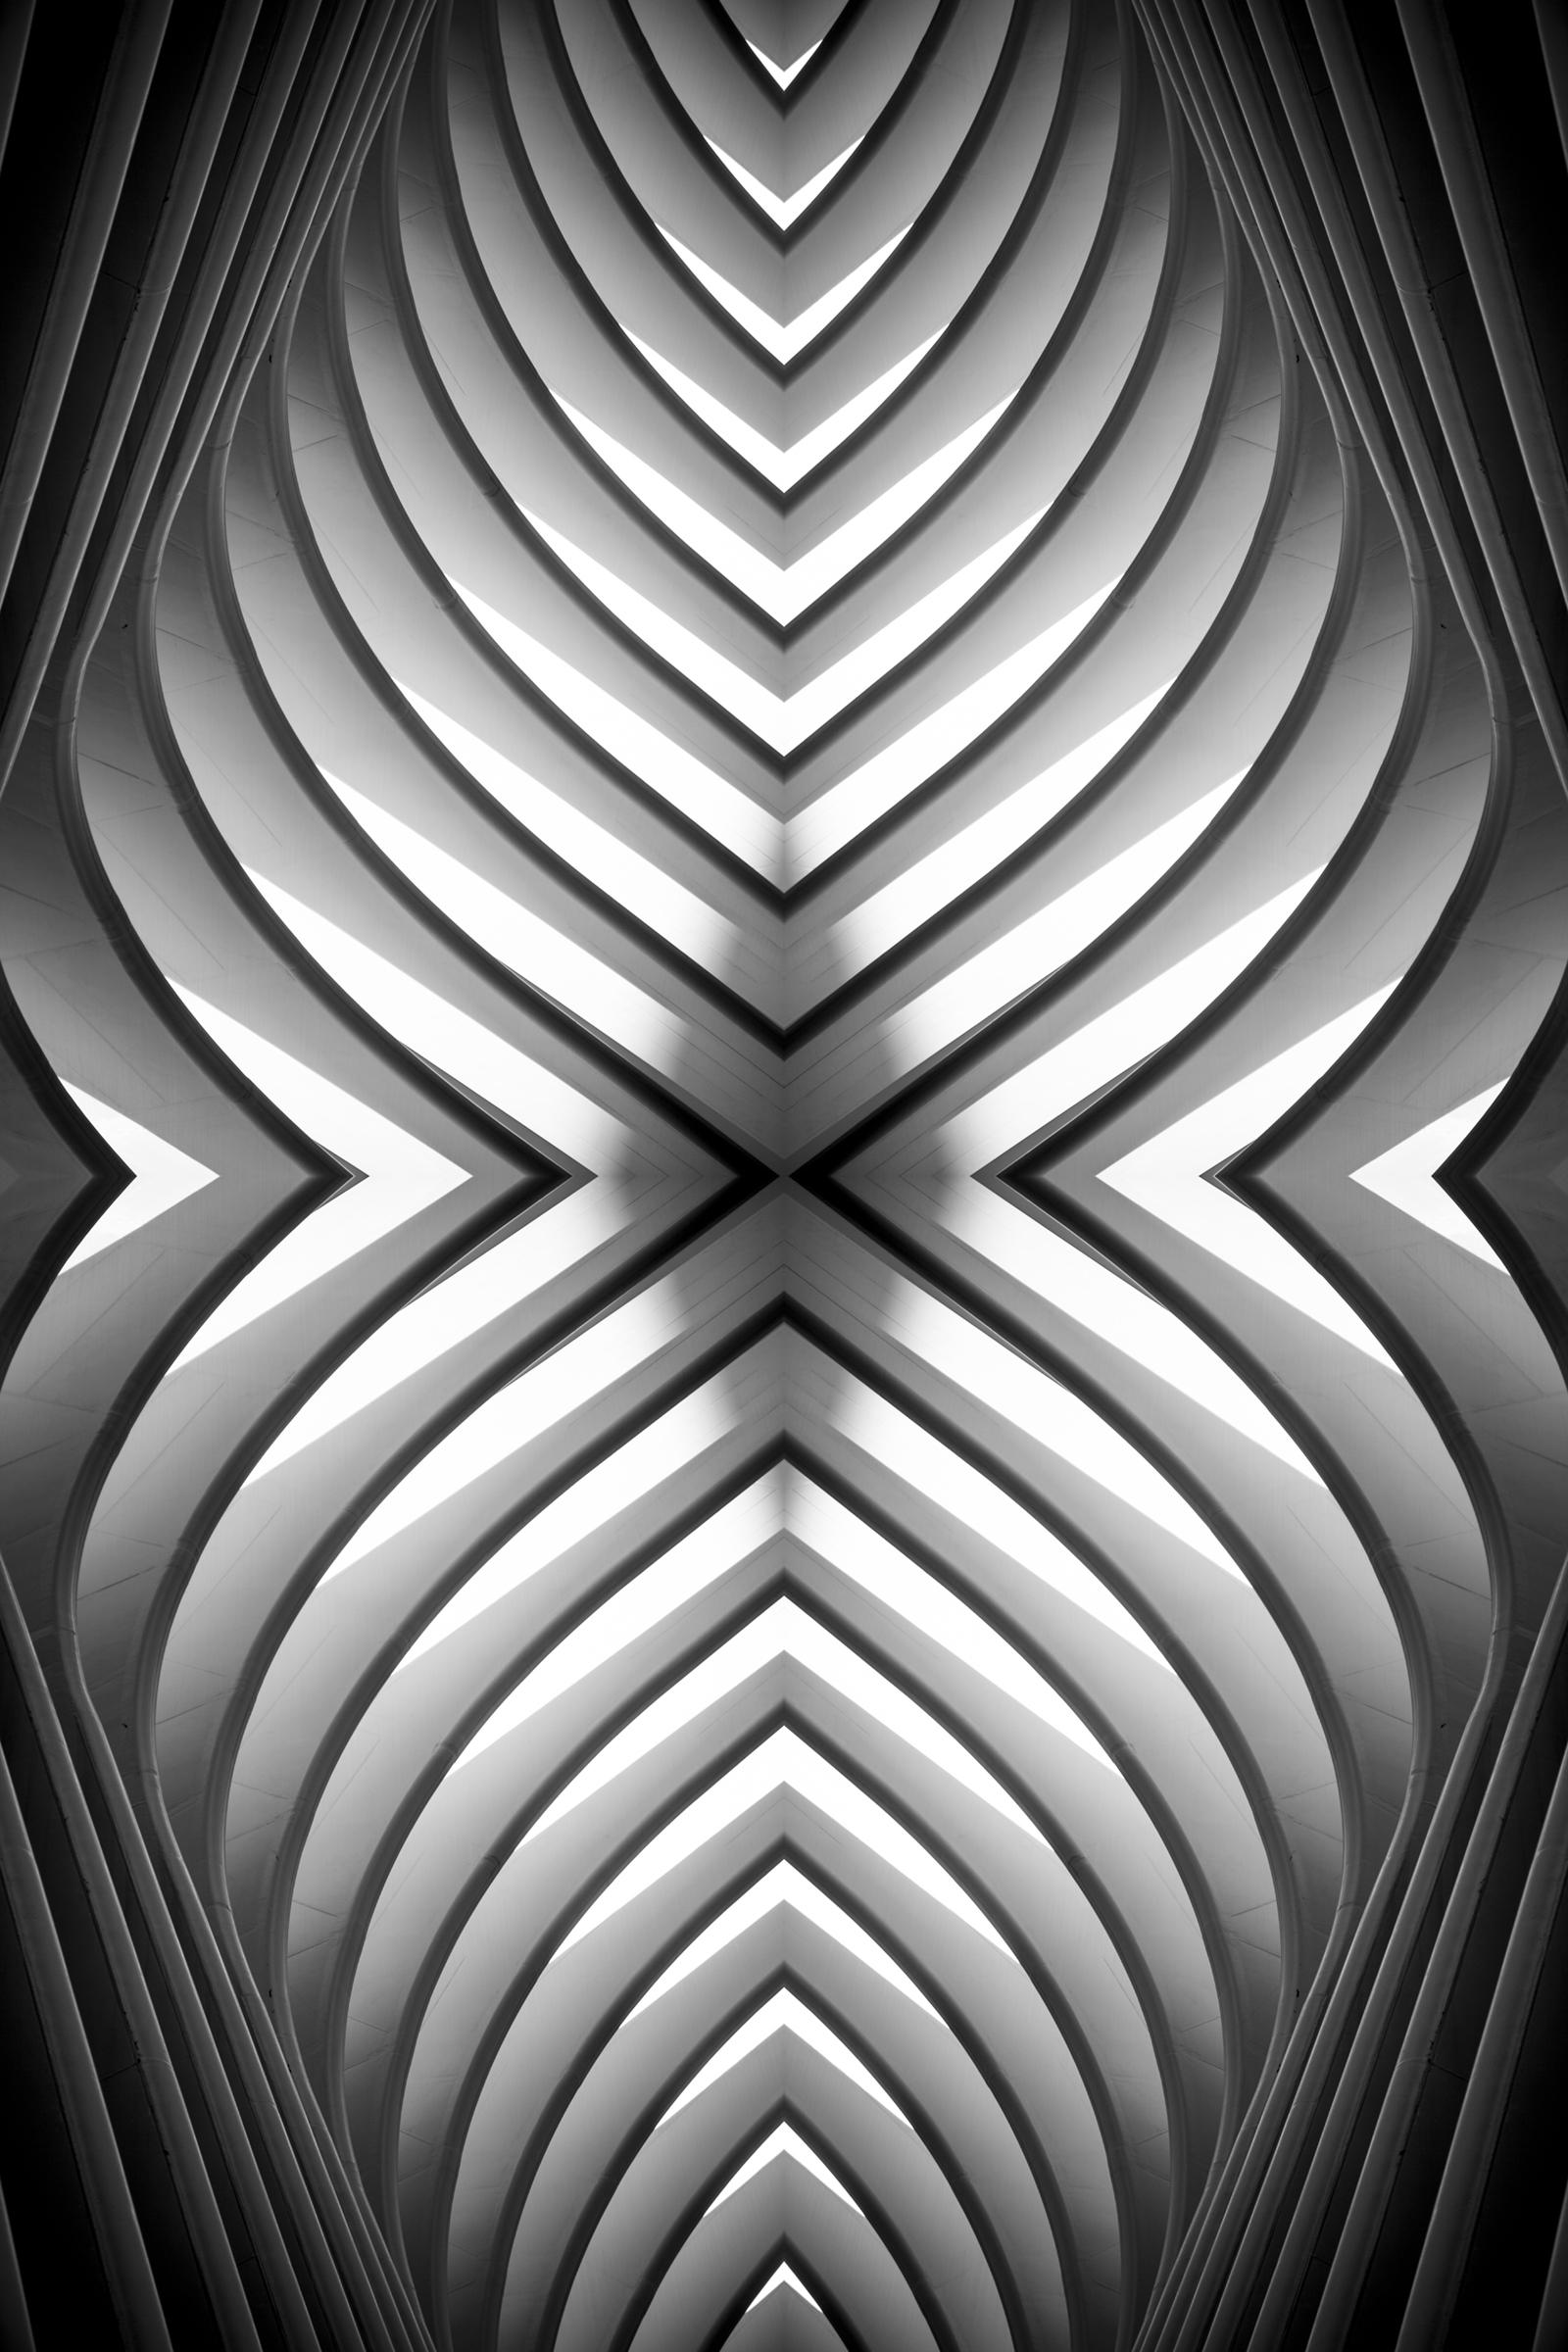 ParianiMark_4_Reflection 173.jpg